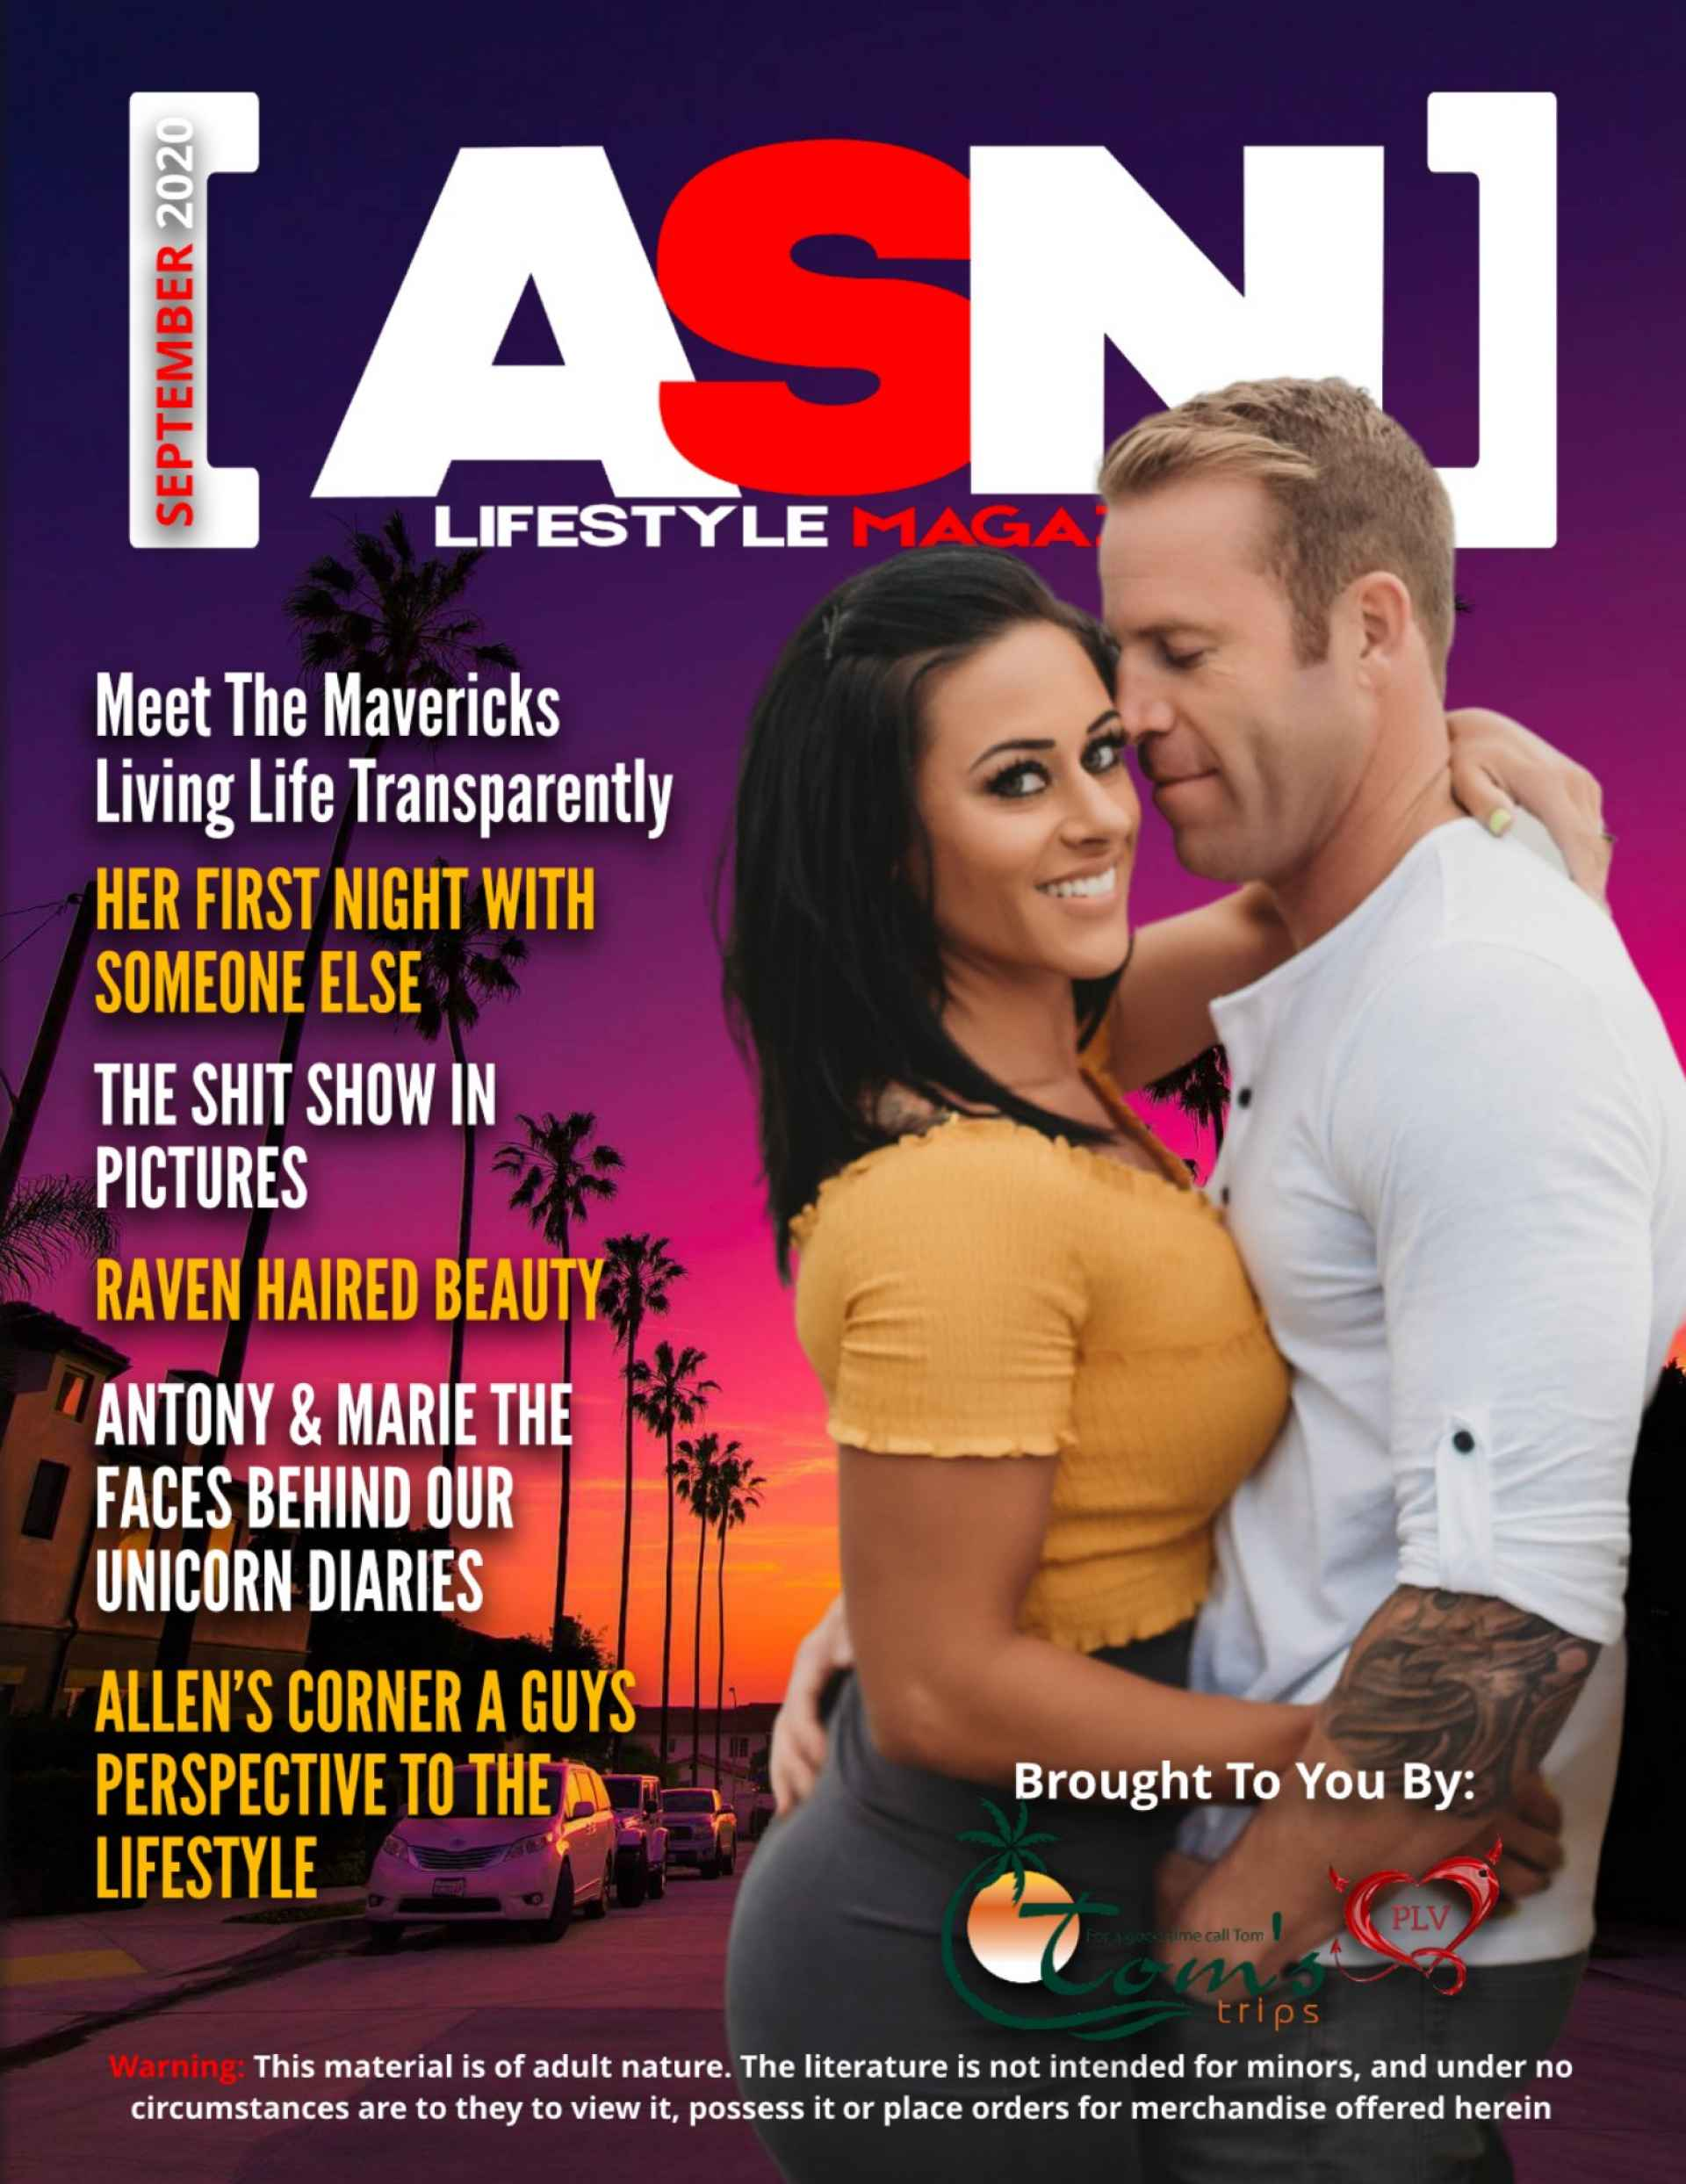 SDC ASN Lifestyle Magazine September 2020 Cover